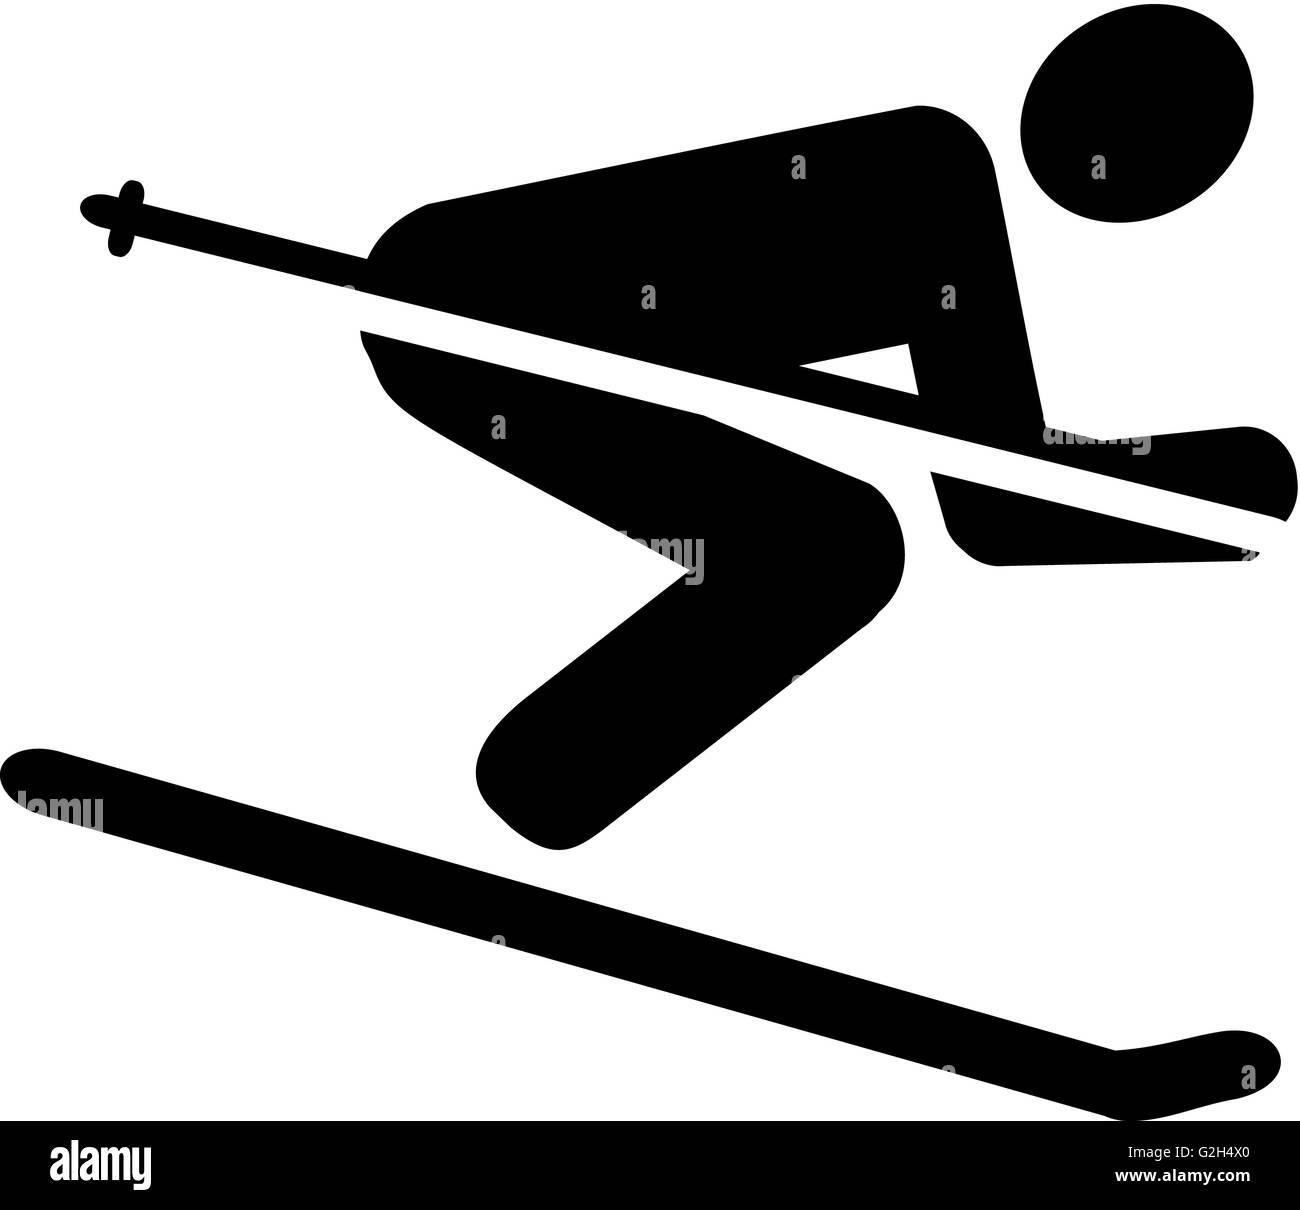 Ski Downhill Pictogram - Stock Image